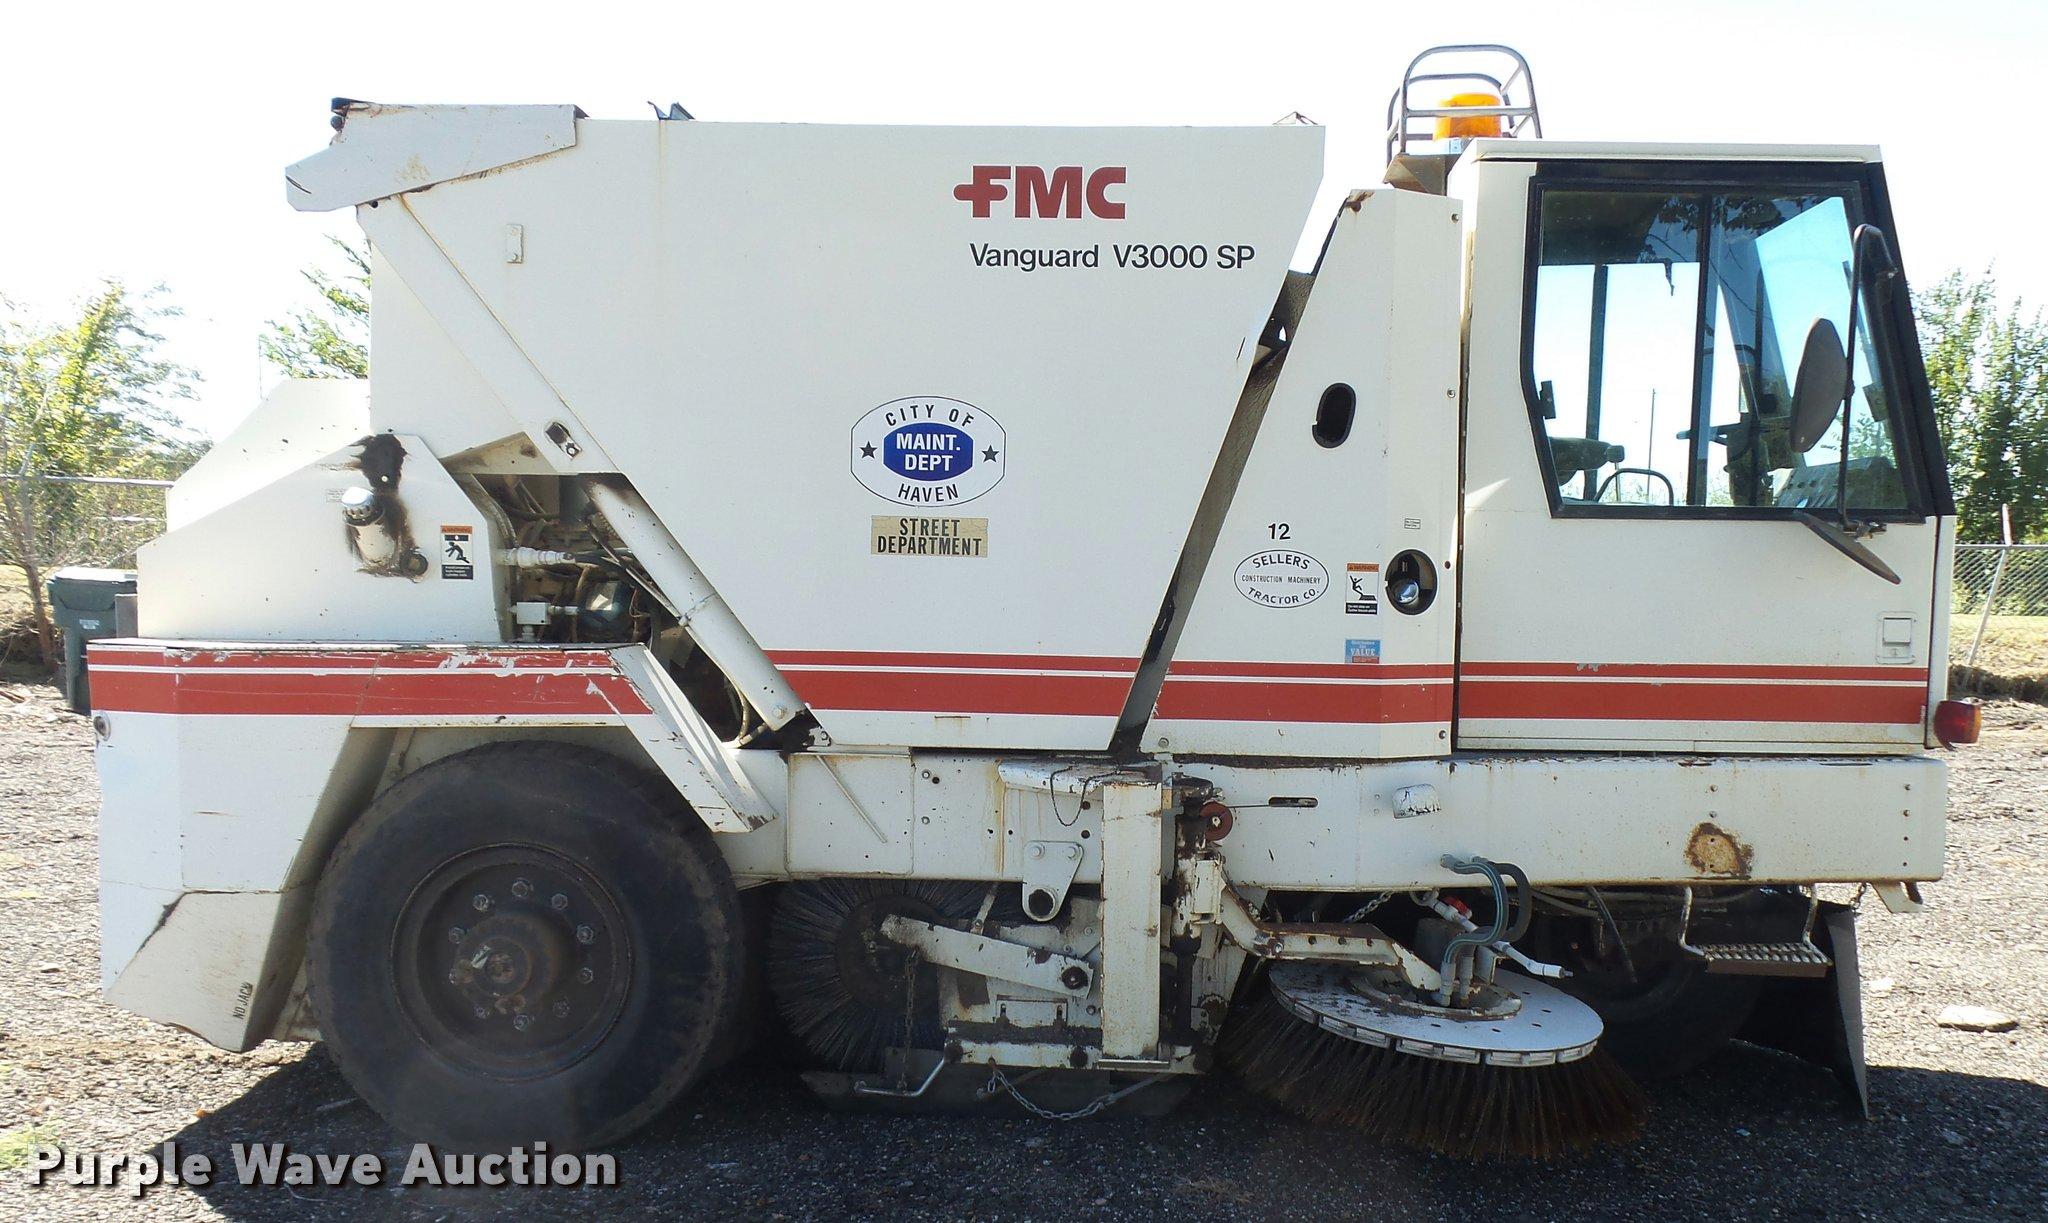 1989 fmc vanguard v3000sp street sweeper item da9815 sol rh purplewave com Vanguard Truck Street Sweeper Tyco Sweeper